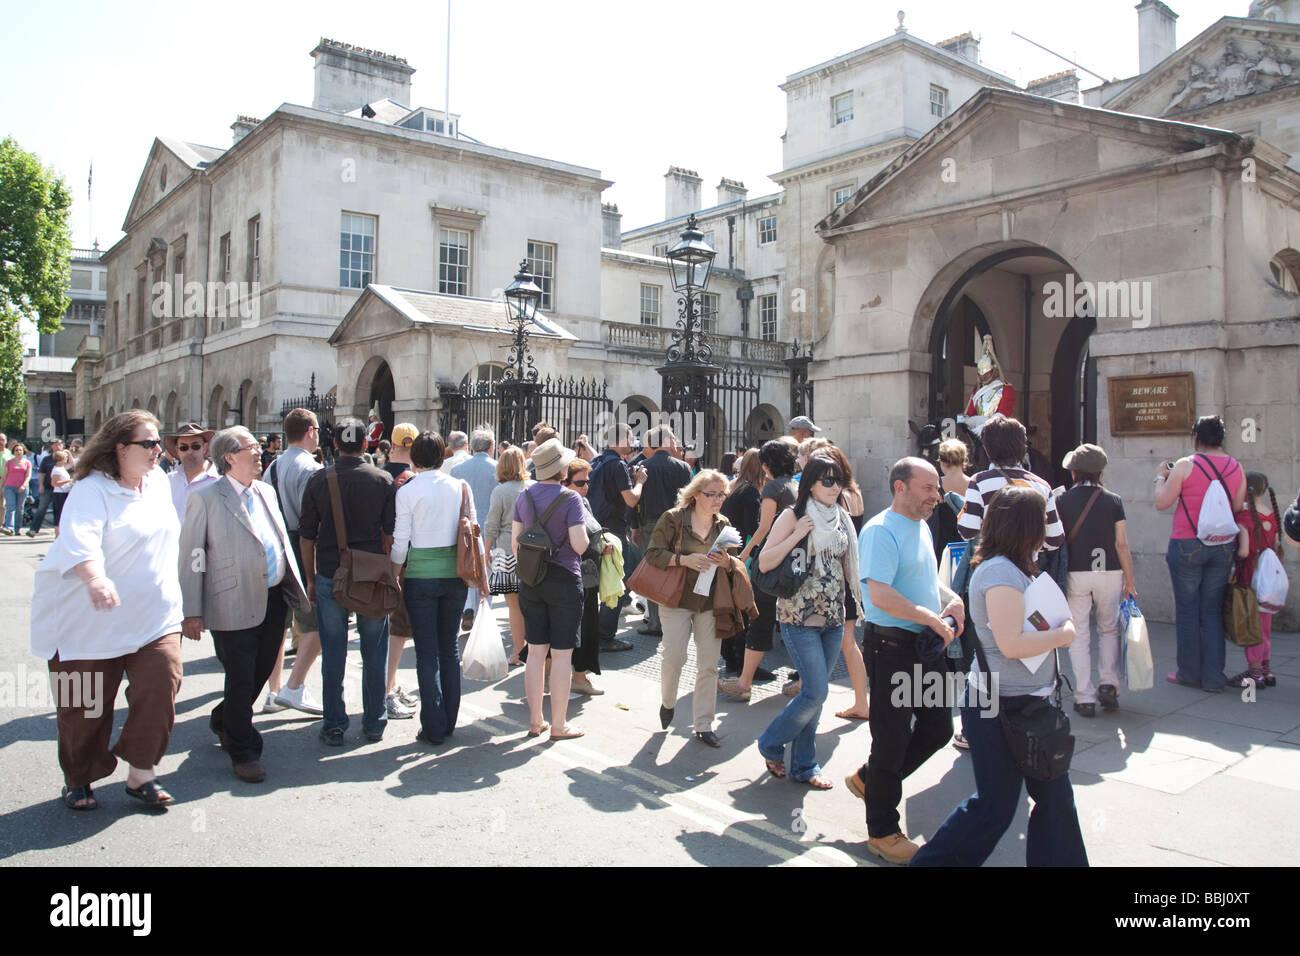 Los turistas - Desfile de guardias a Caballo - Whitehall - Londres Imagen De Stock